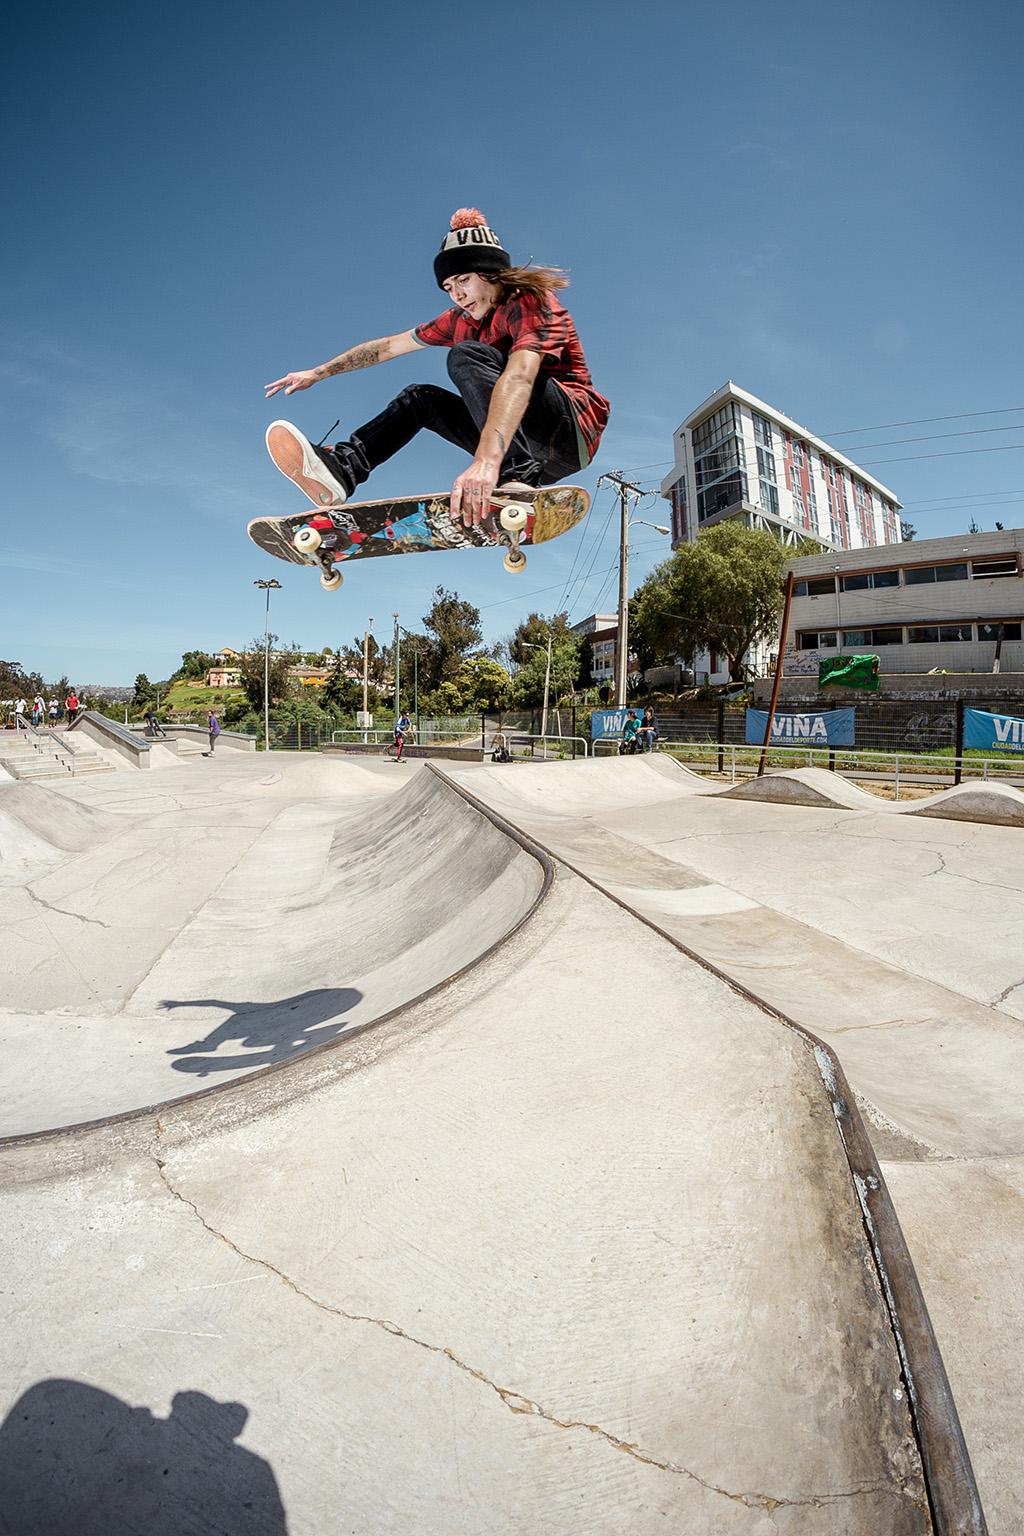 ENCONCRETO/ Skateparks de Chile / GLOBE, CAP04 Viña del Mar